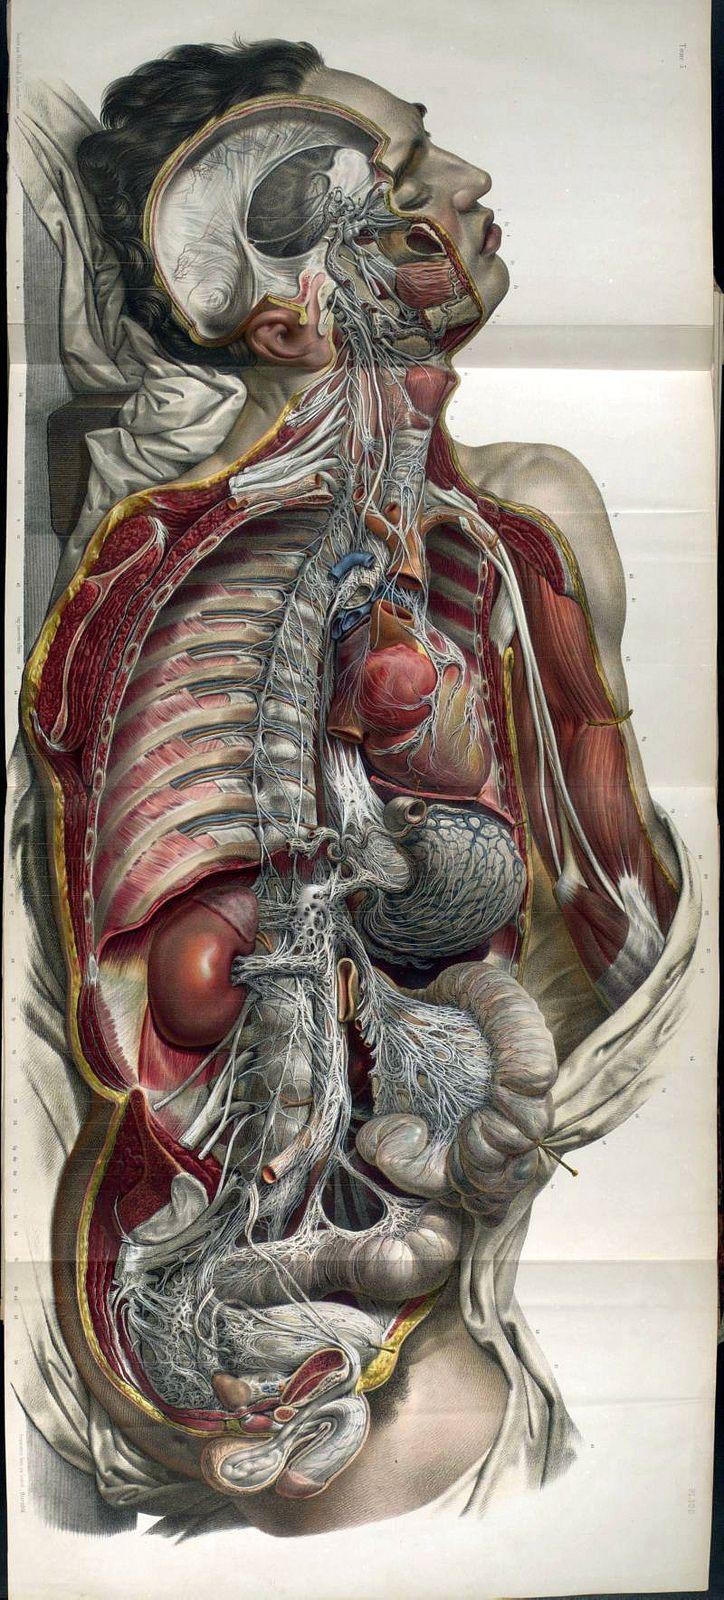 Anatomy Illustrations 1800s | Pinterest